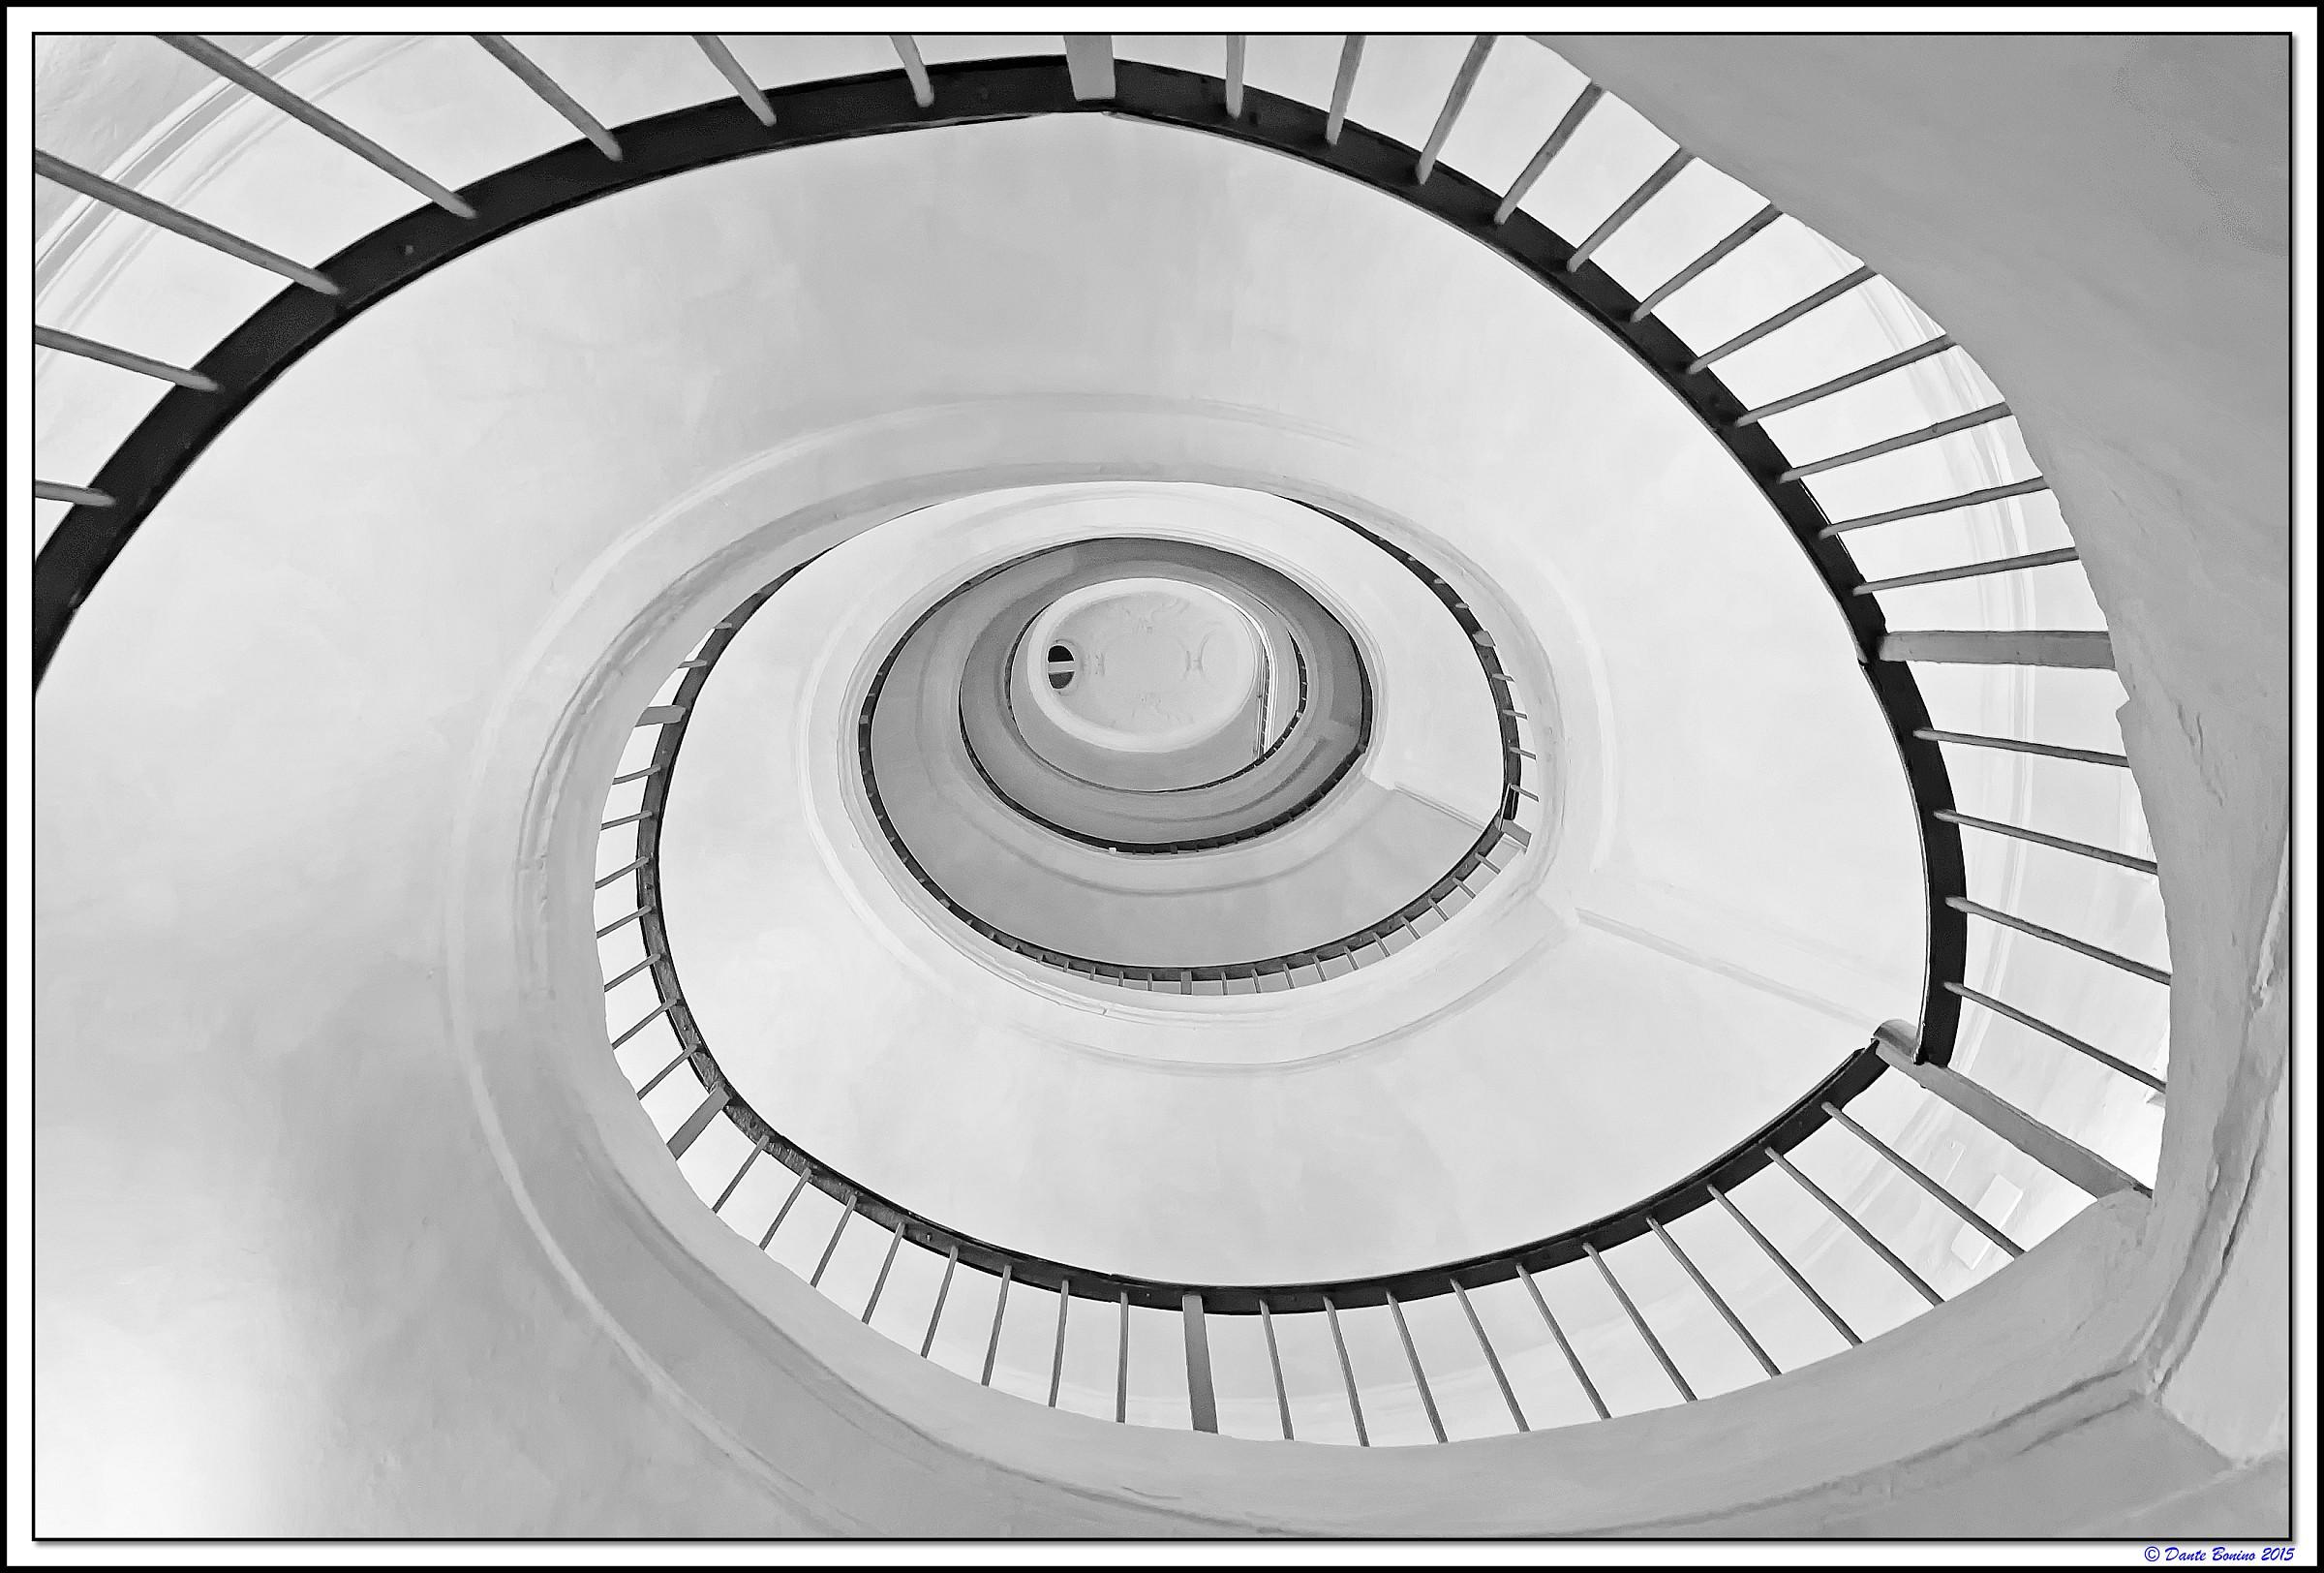 Palazzo Carignano: Scale of elliptical culverts...